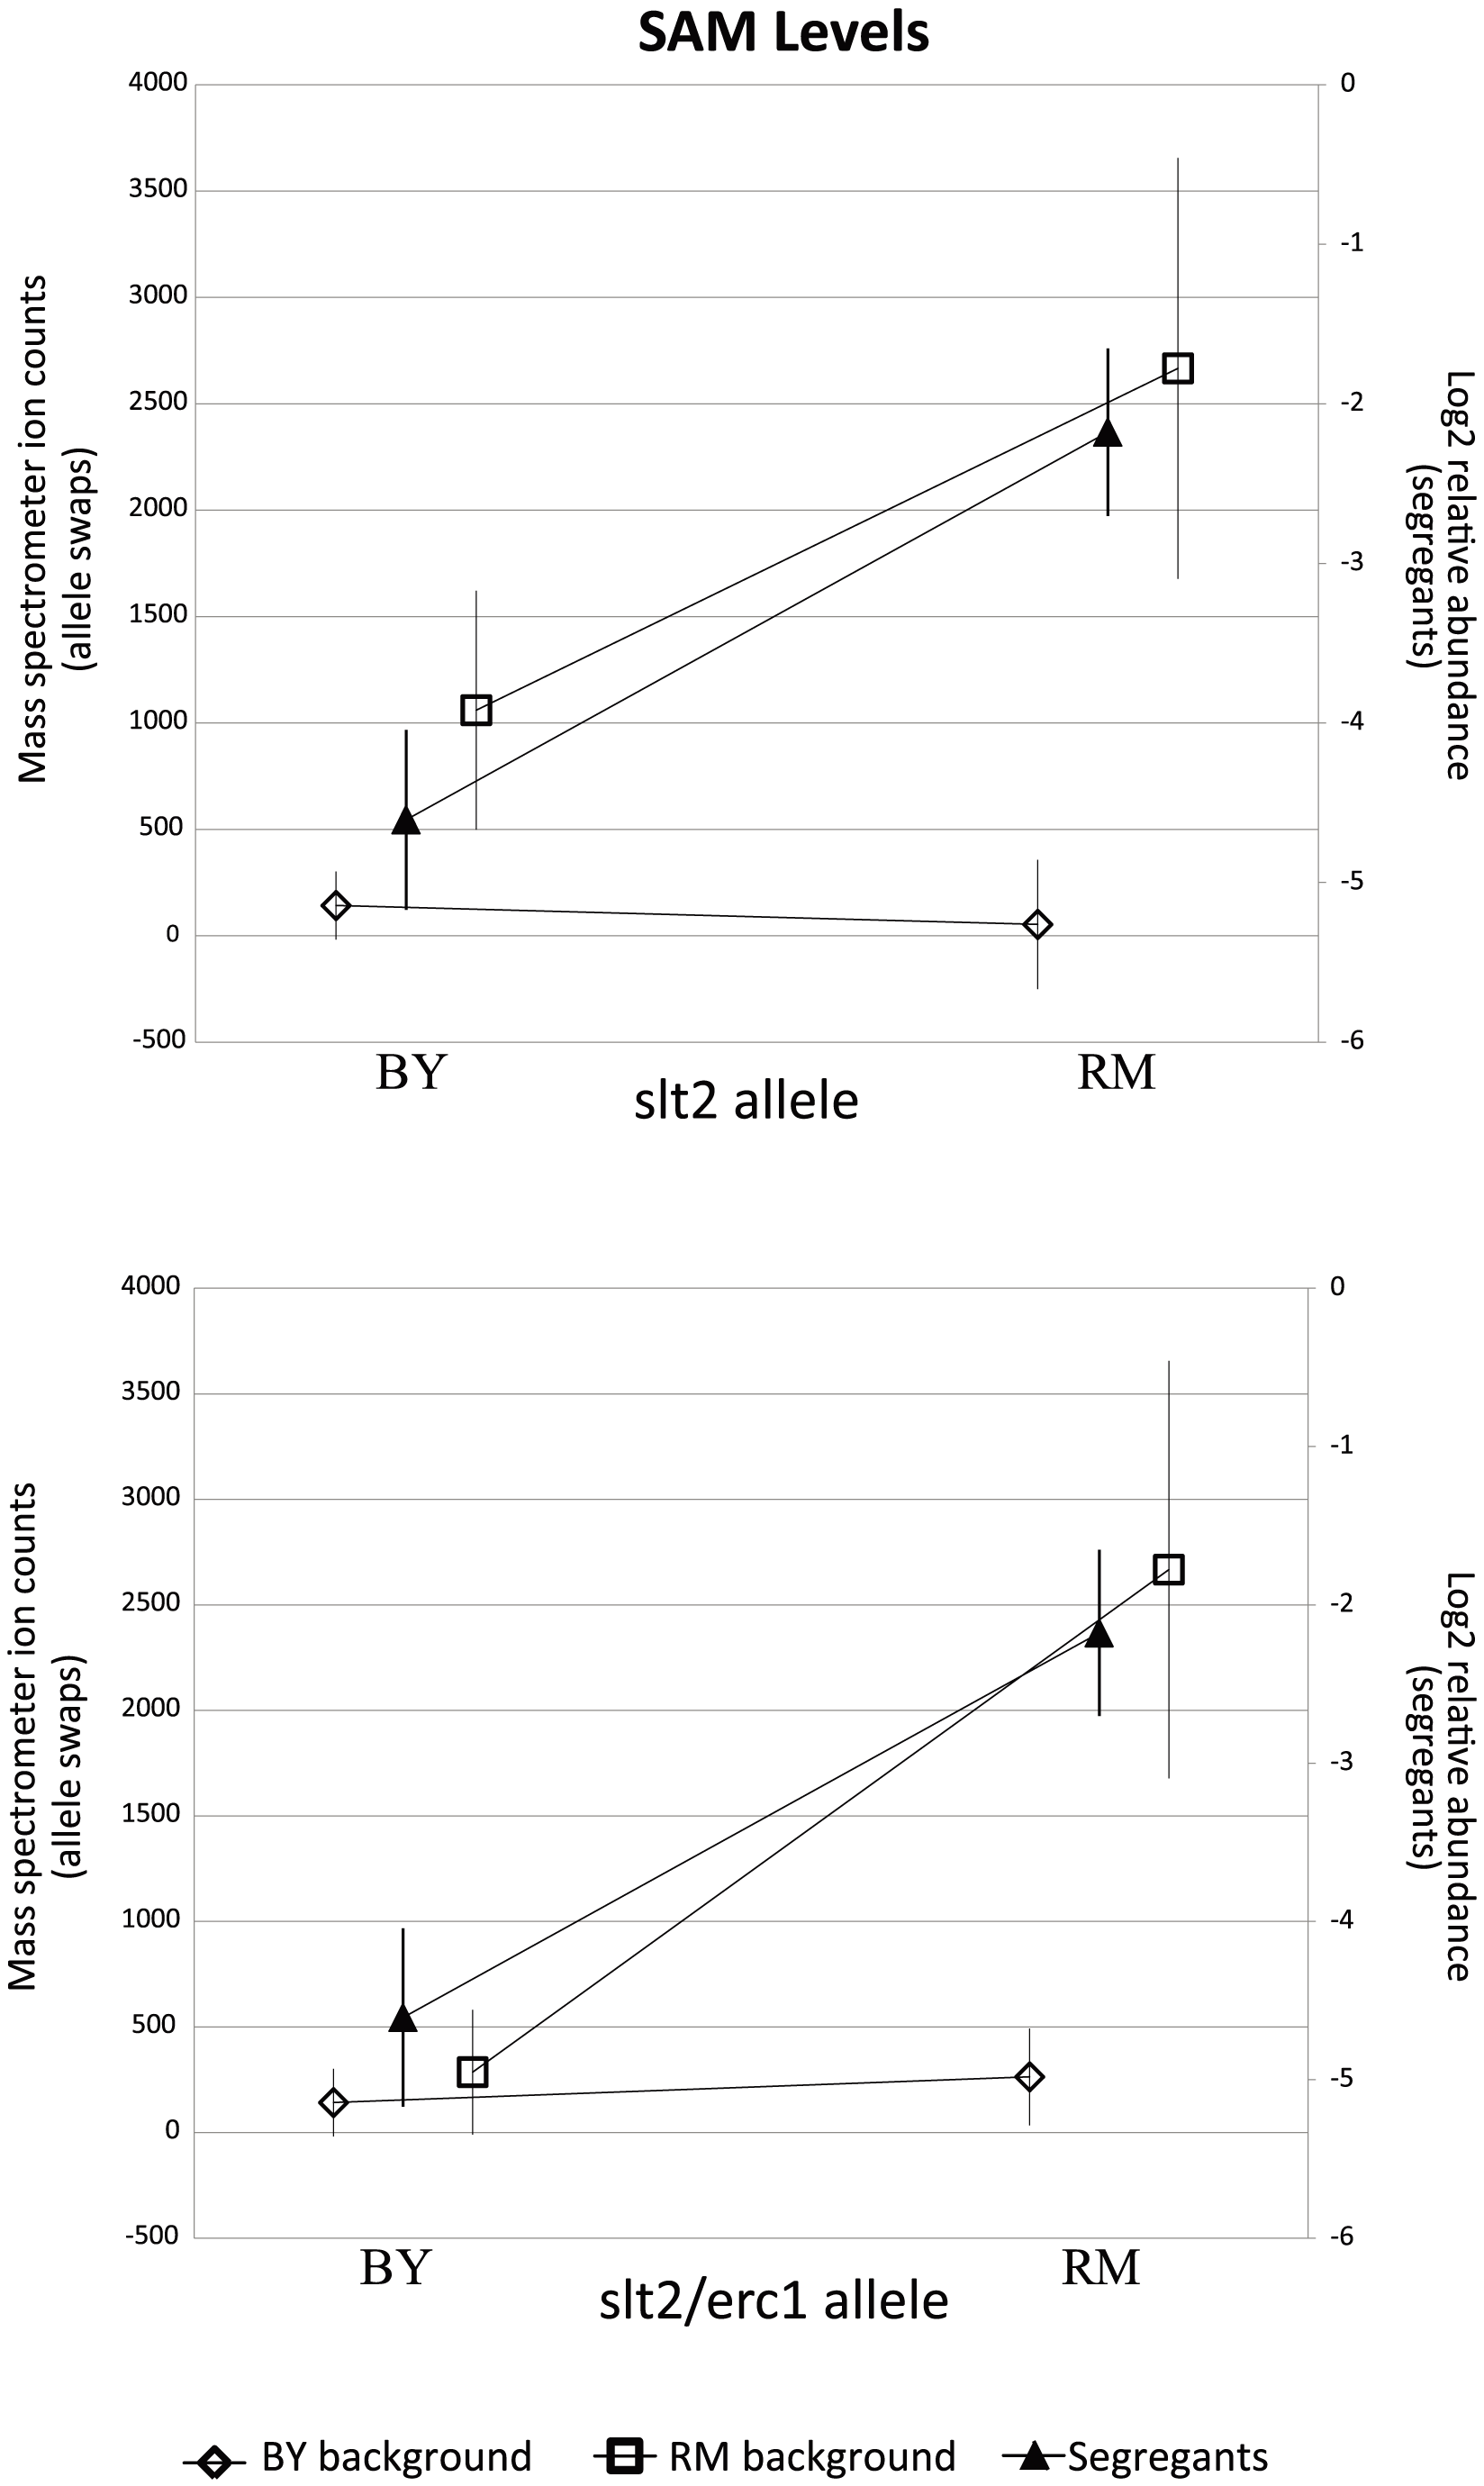 RM-inheriting segregants for <i>slt2</i> and <i>erc1</i> show significantly higher levels for SAM.